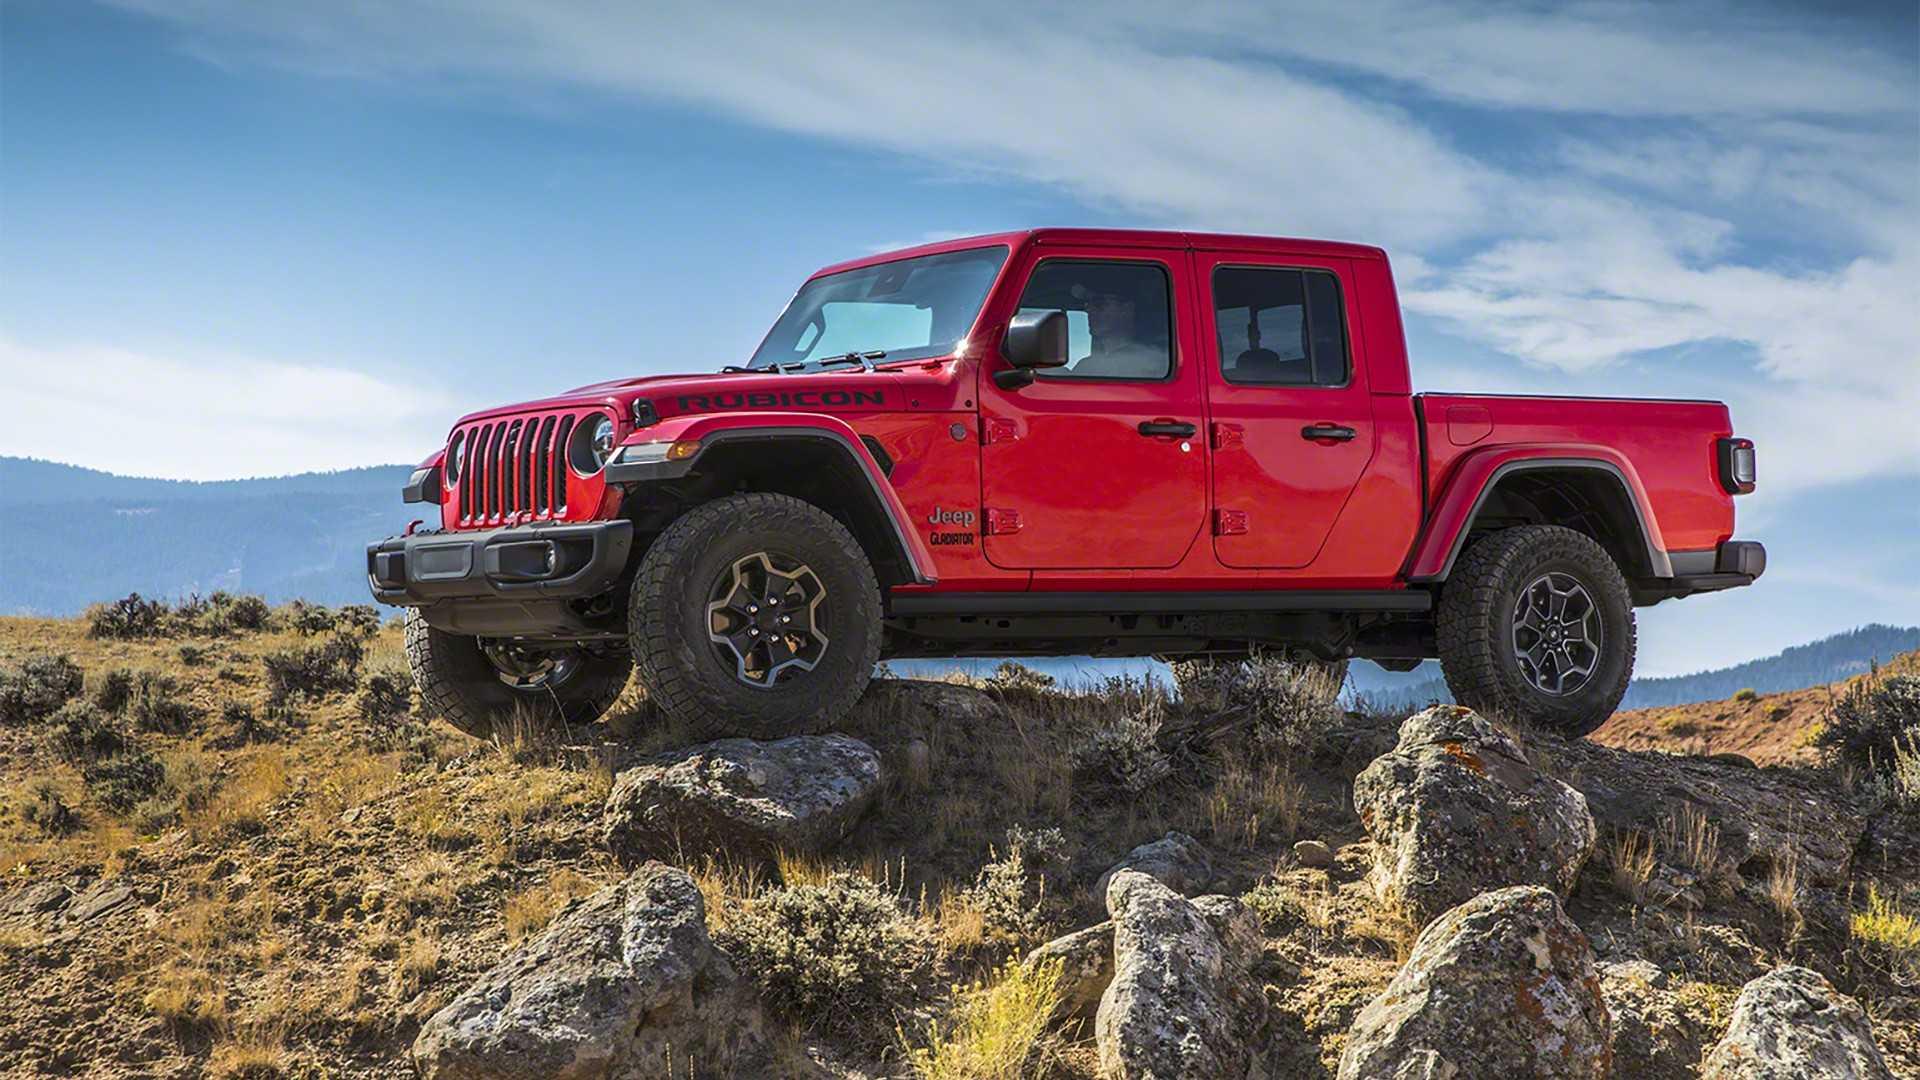 Jeep Gladiator, από τον Απρίλιο και στην Ελλάδα